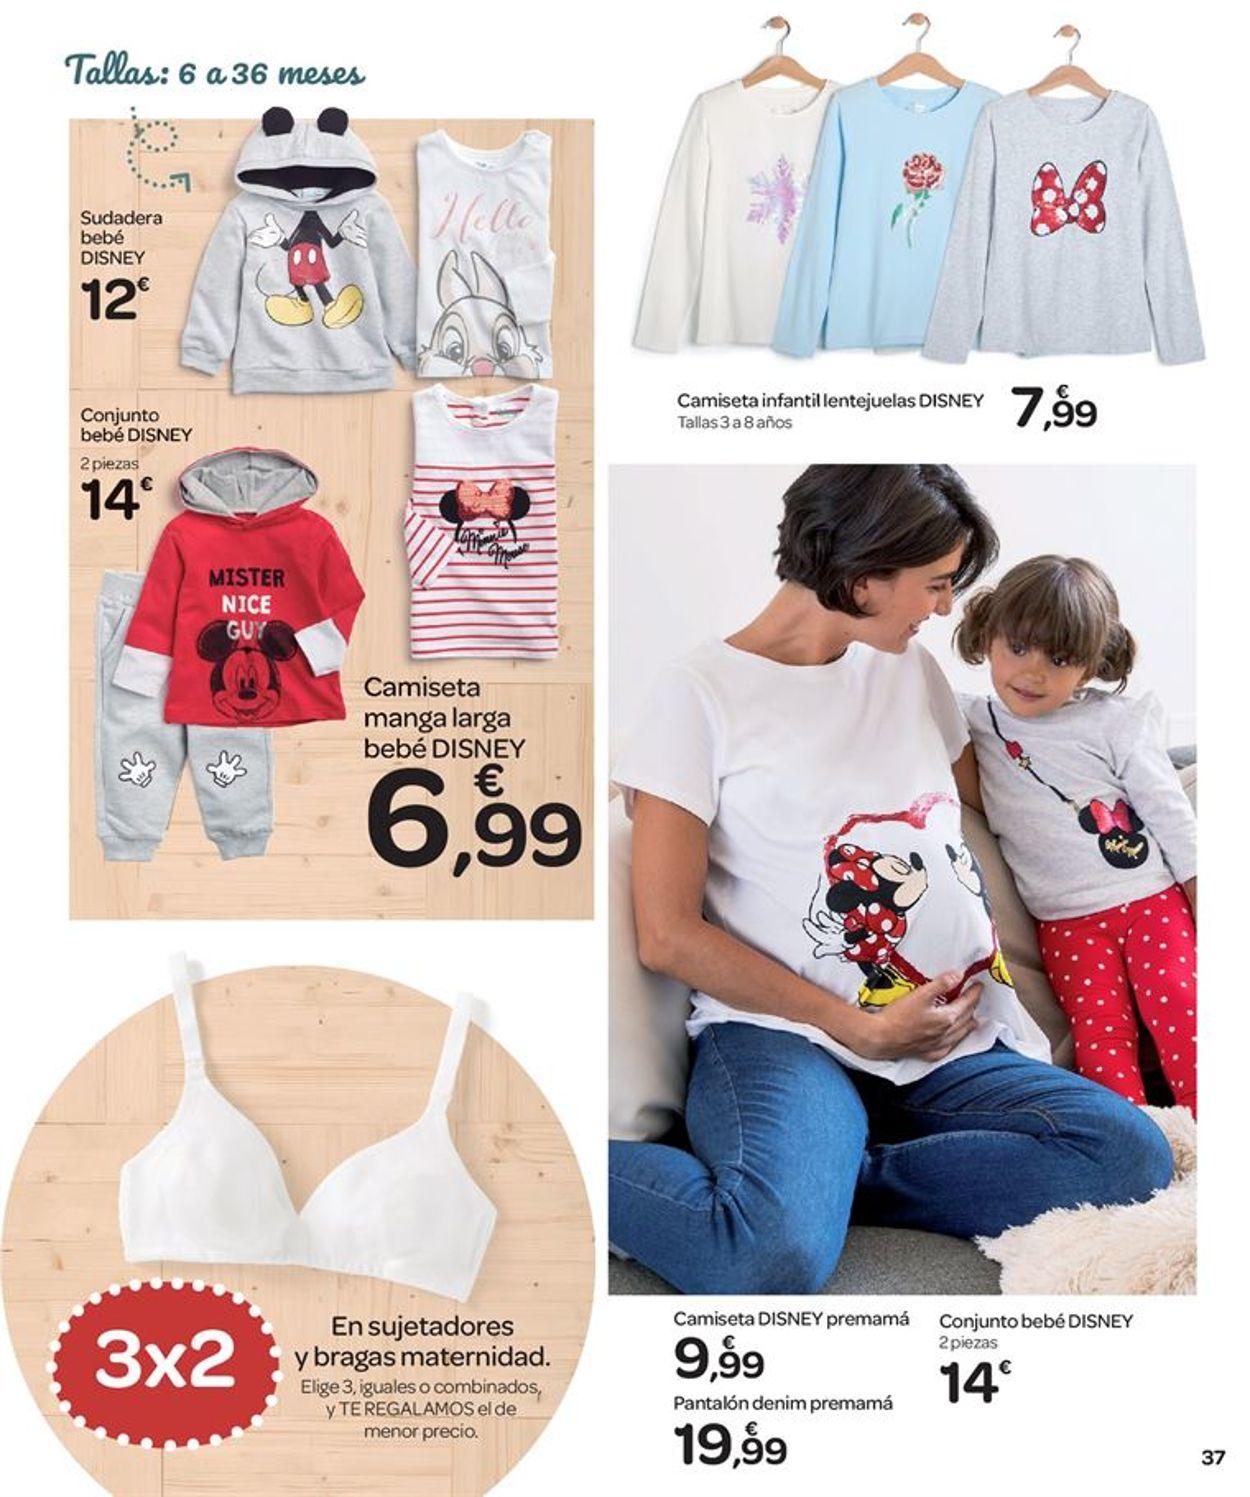 Carrefour Folleto - 30.08-23.09.2019 (Página 37)